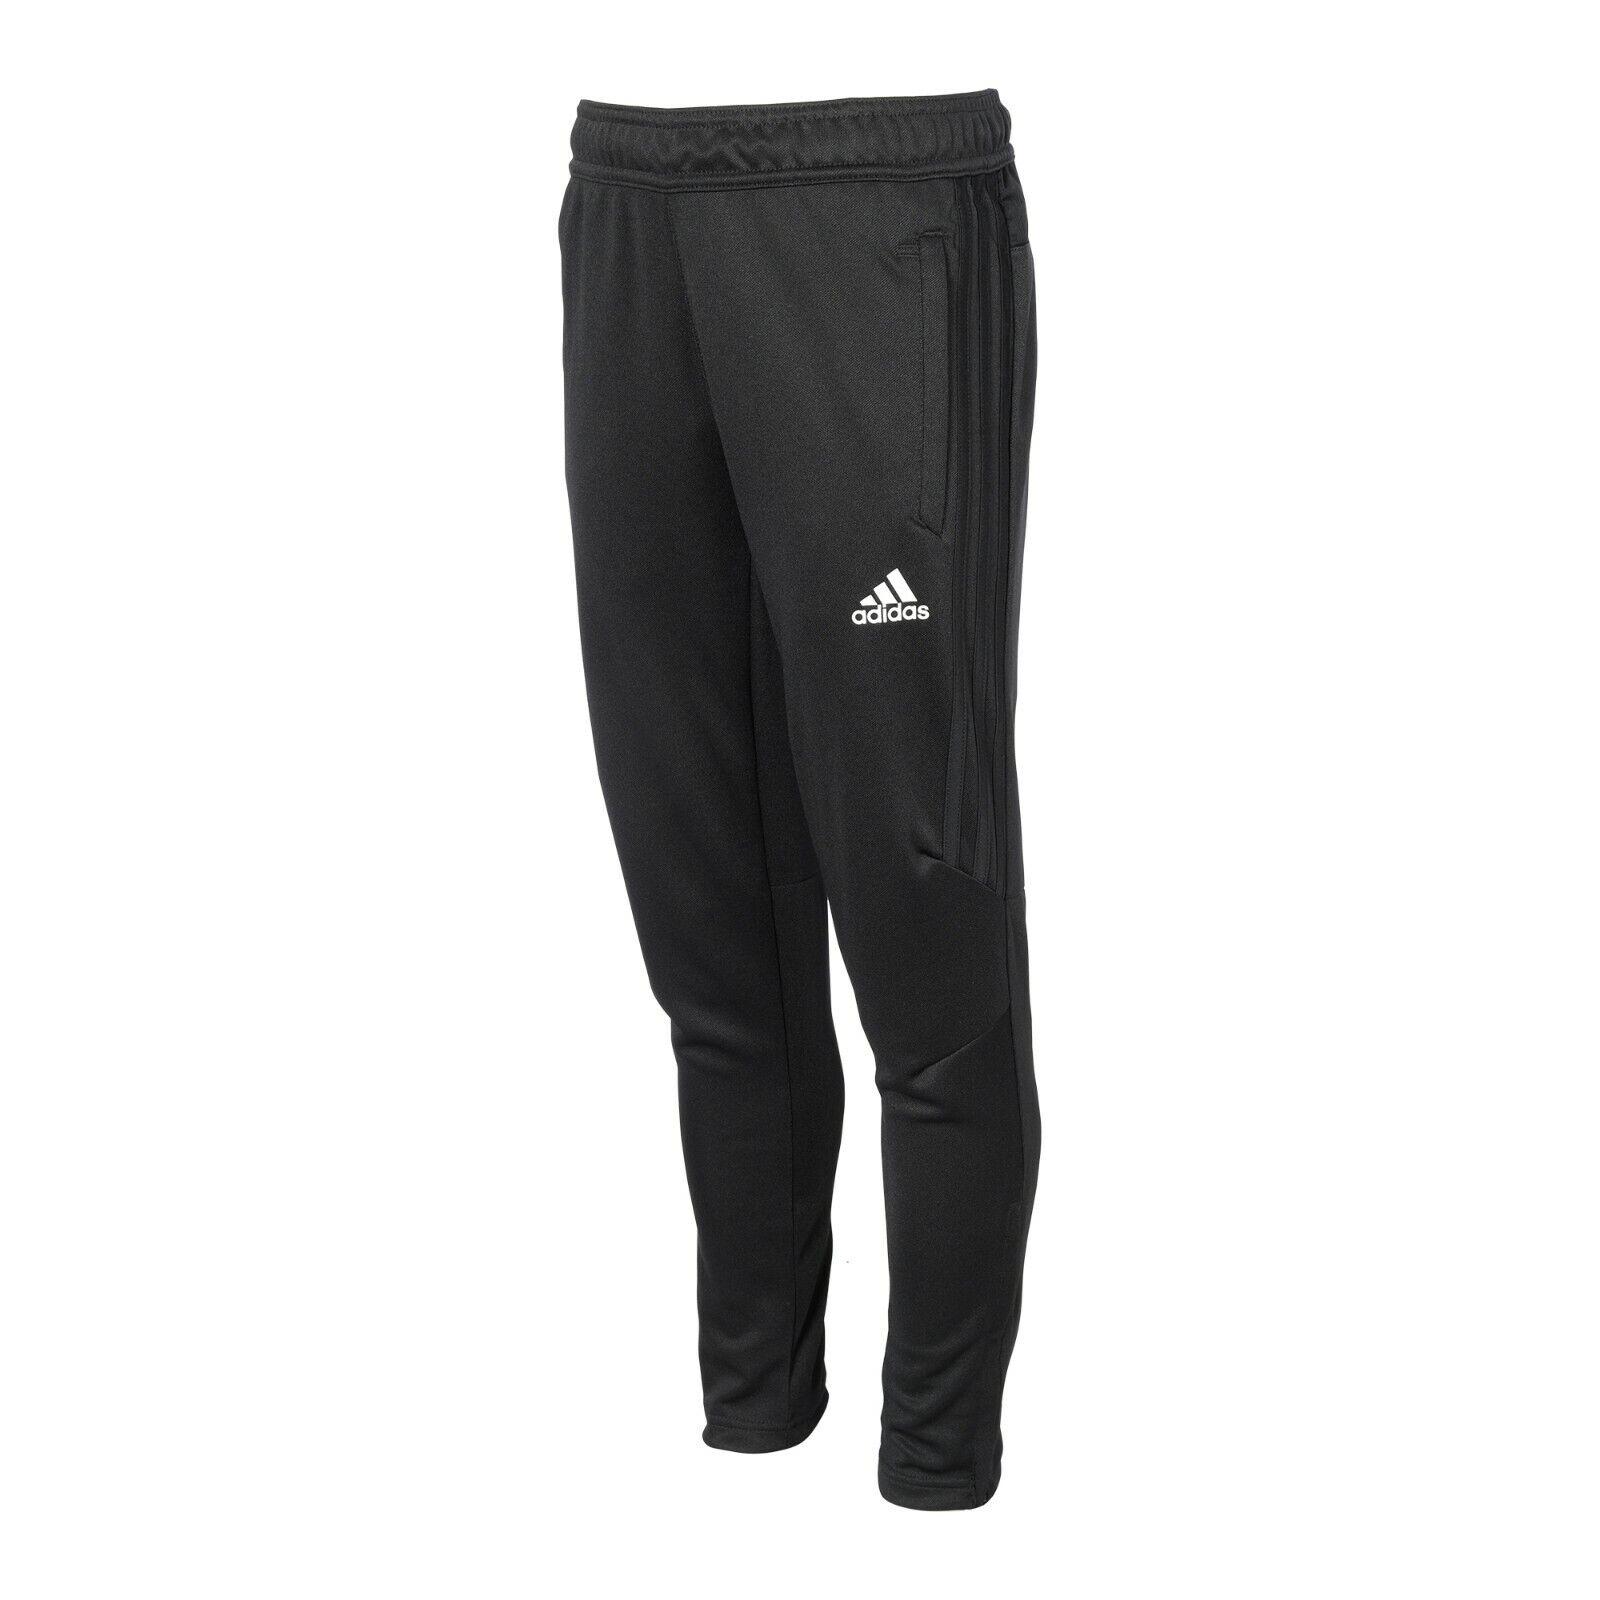 Adidas Tiro 17 Training Pants/Youth, Womens/Brand New/60% OF